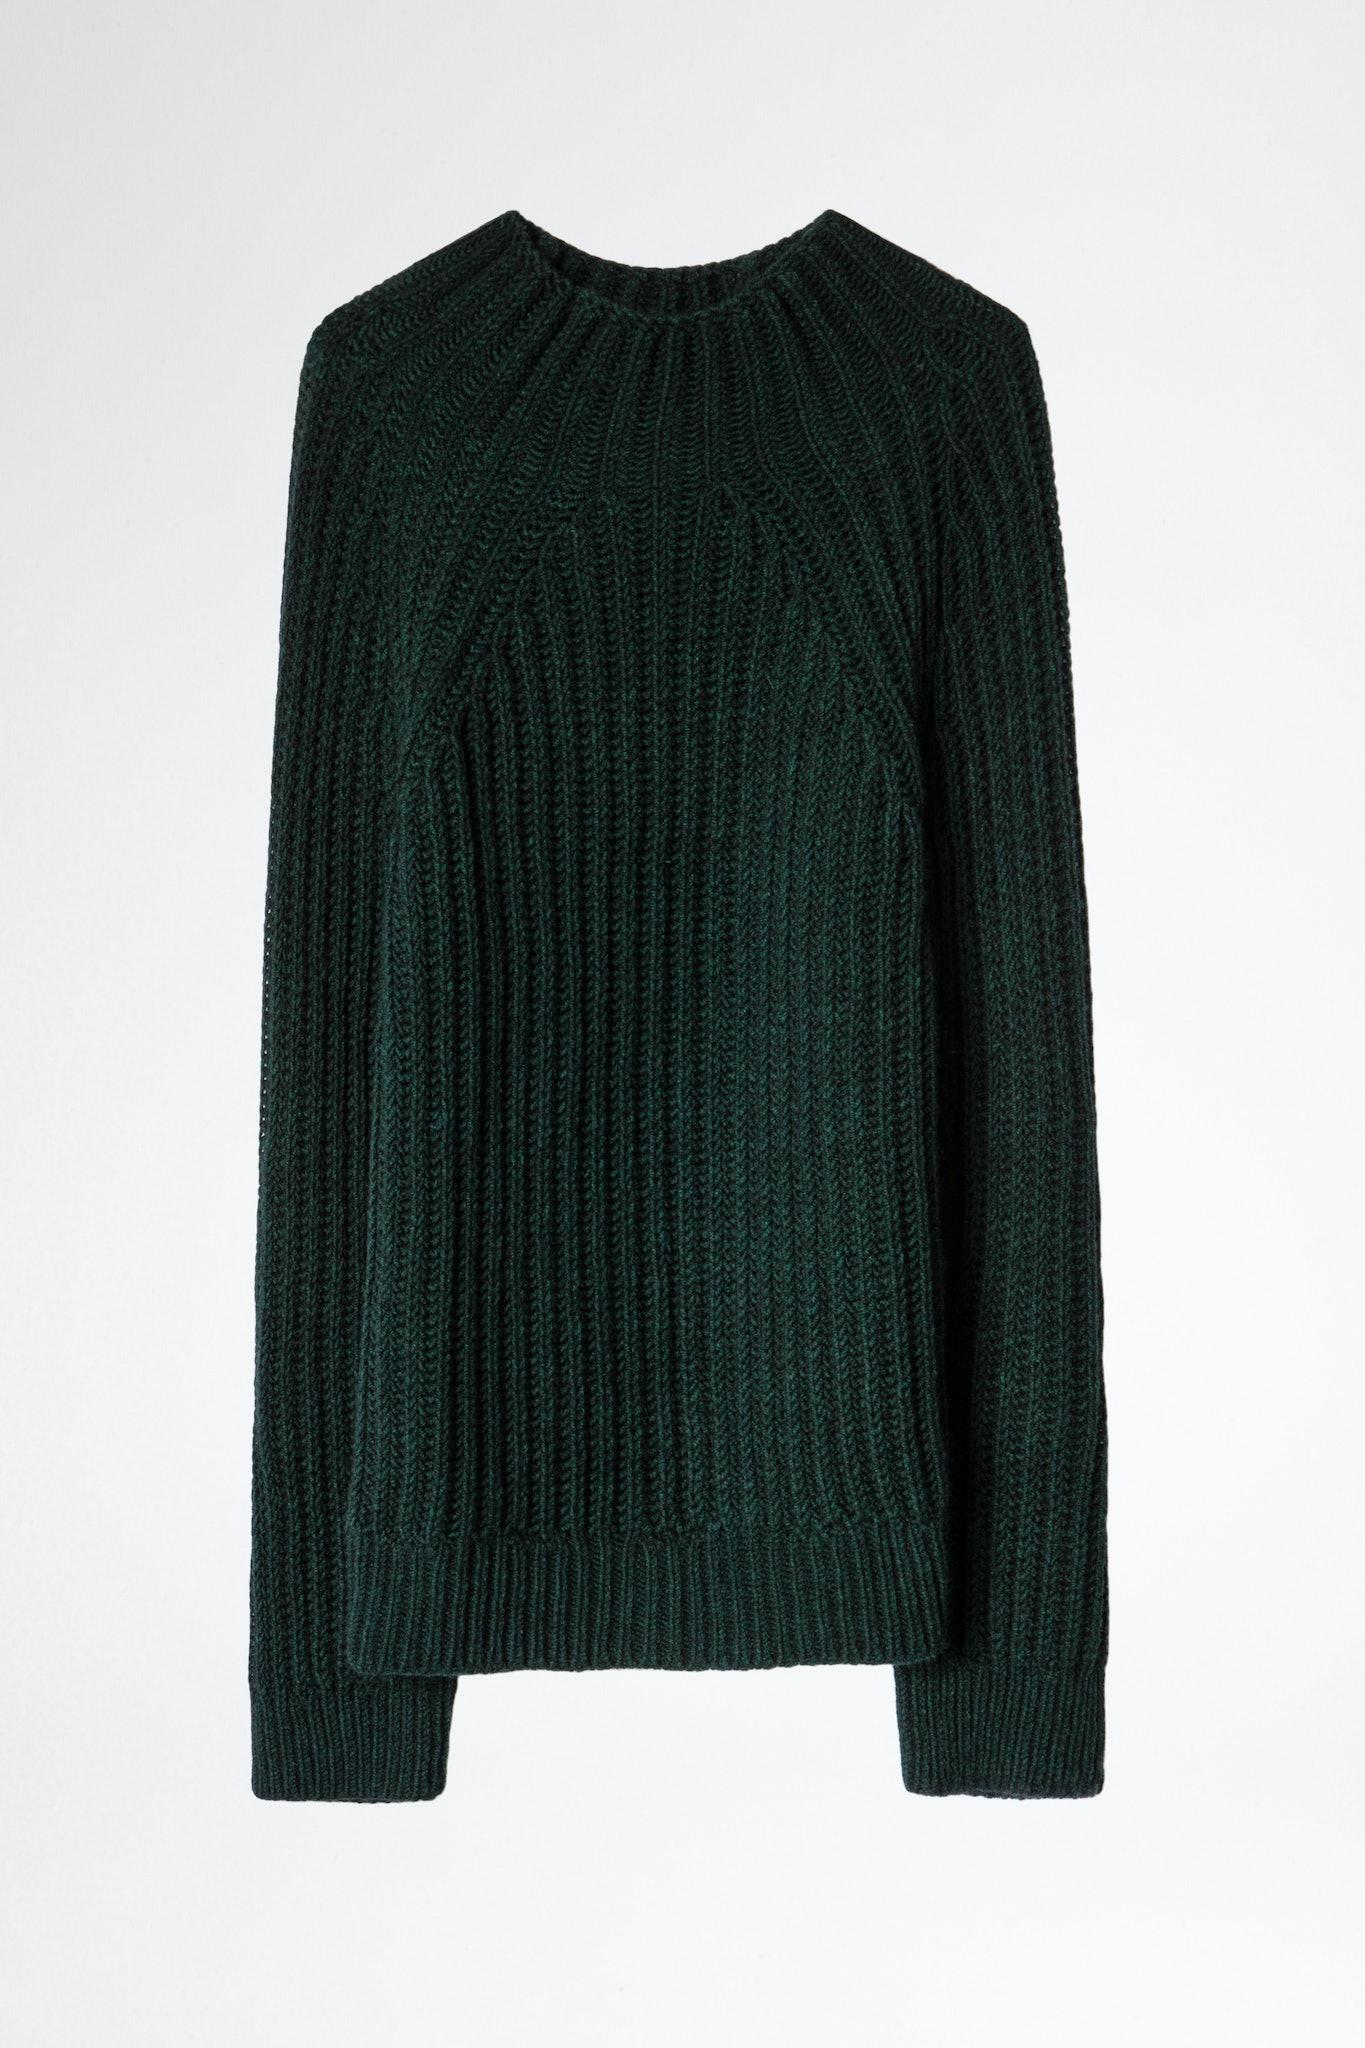 Artie Awa Sweater